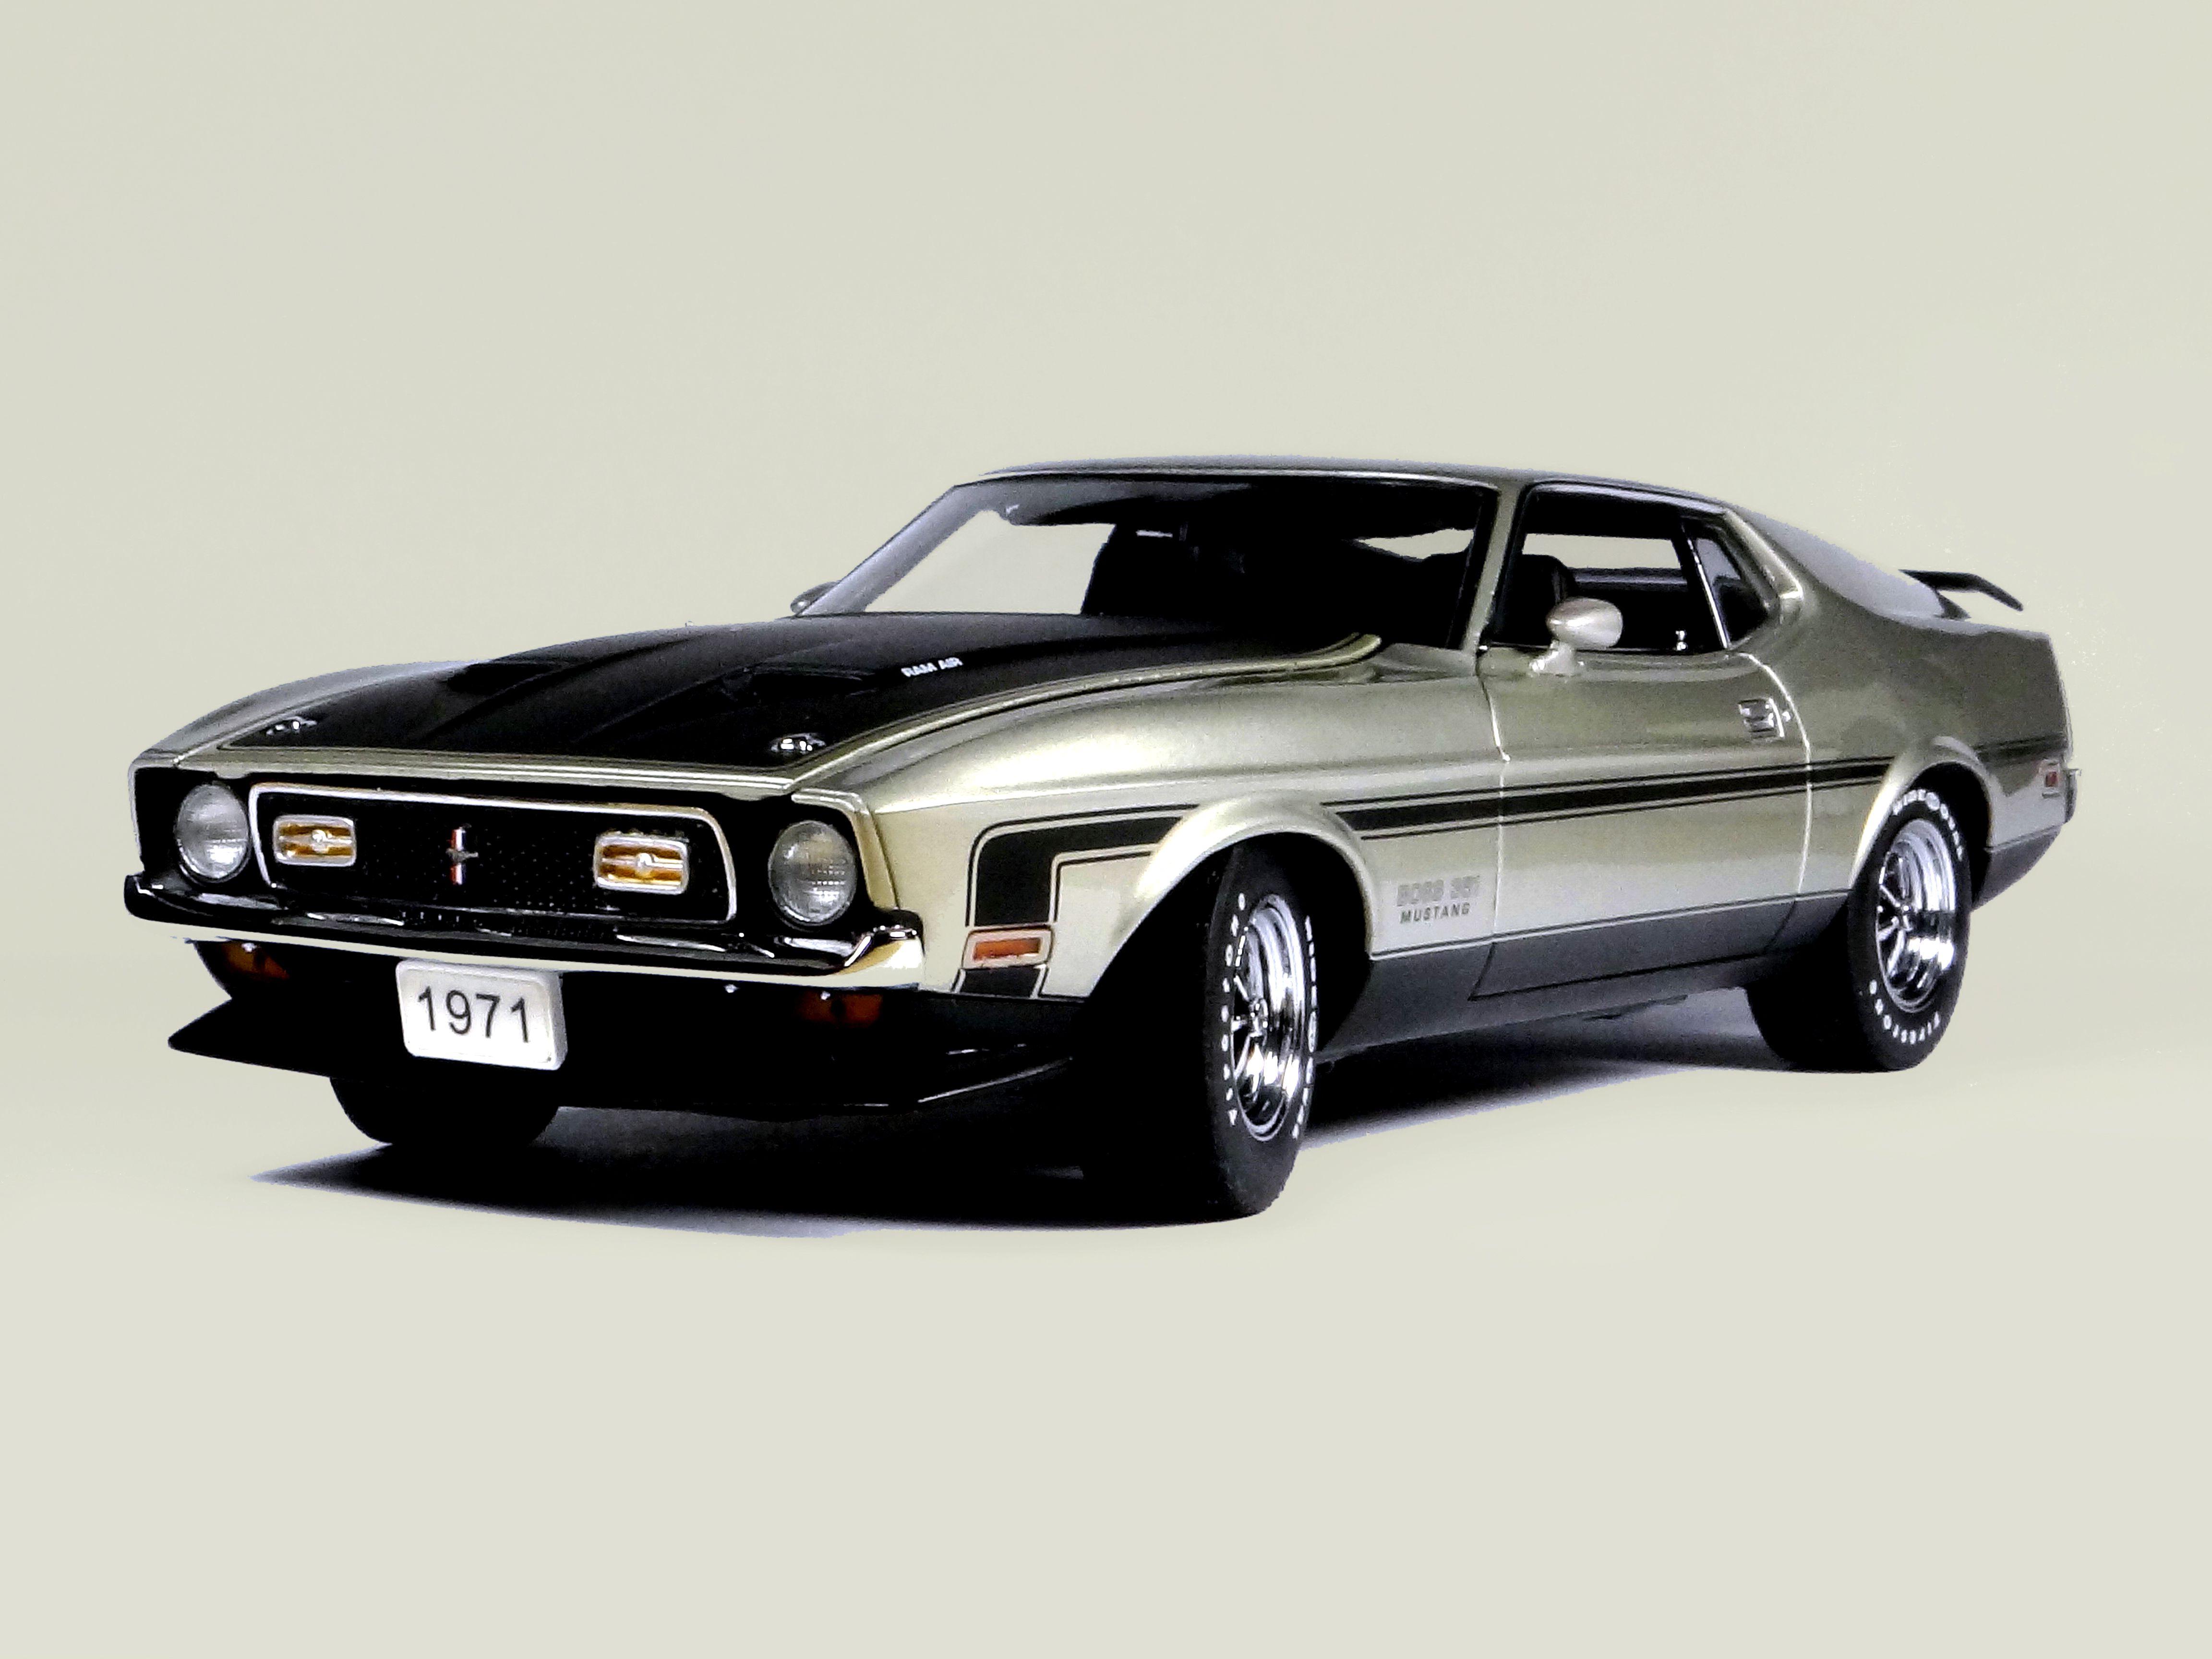 1971 Mustang Boss 351 Classic Cars Muscle Classic Mustang Mustang